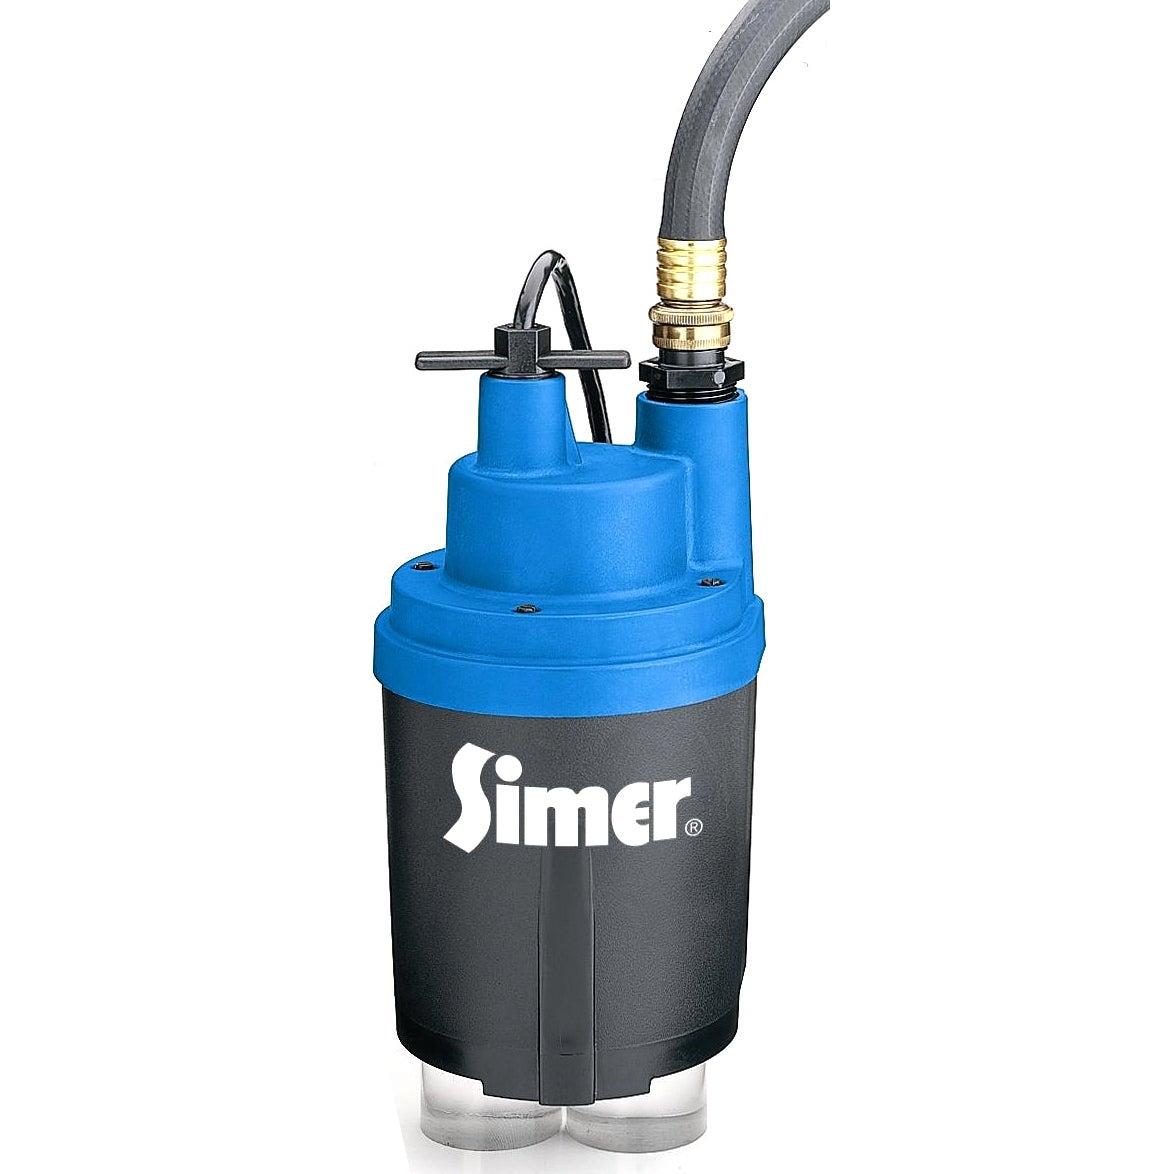 Pentair Simer 2330-03 Smart Geyser Ulility Pump (Pump Uti...